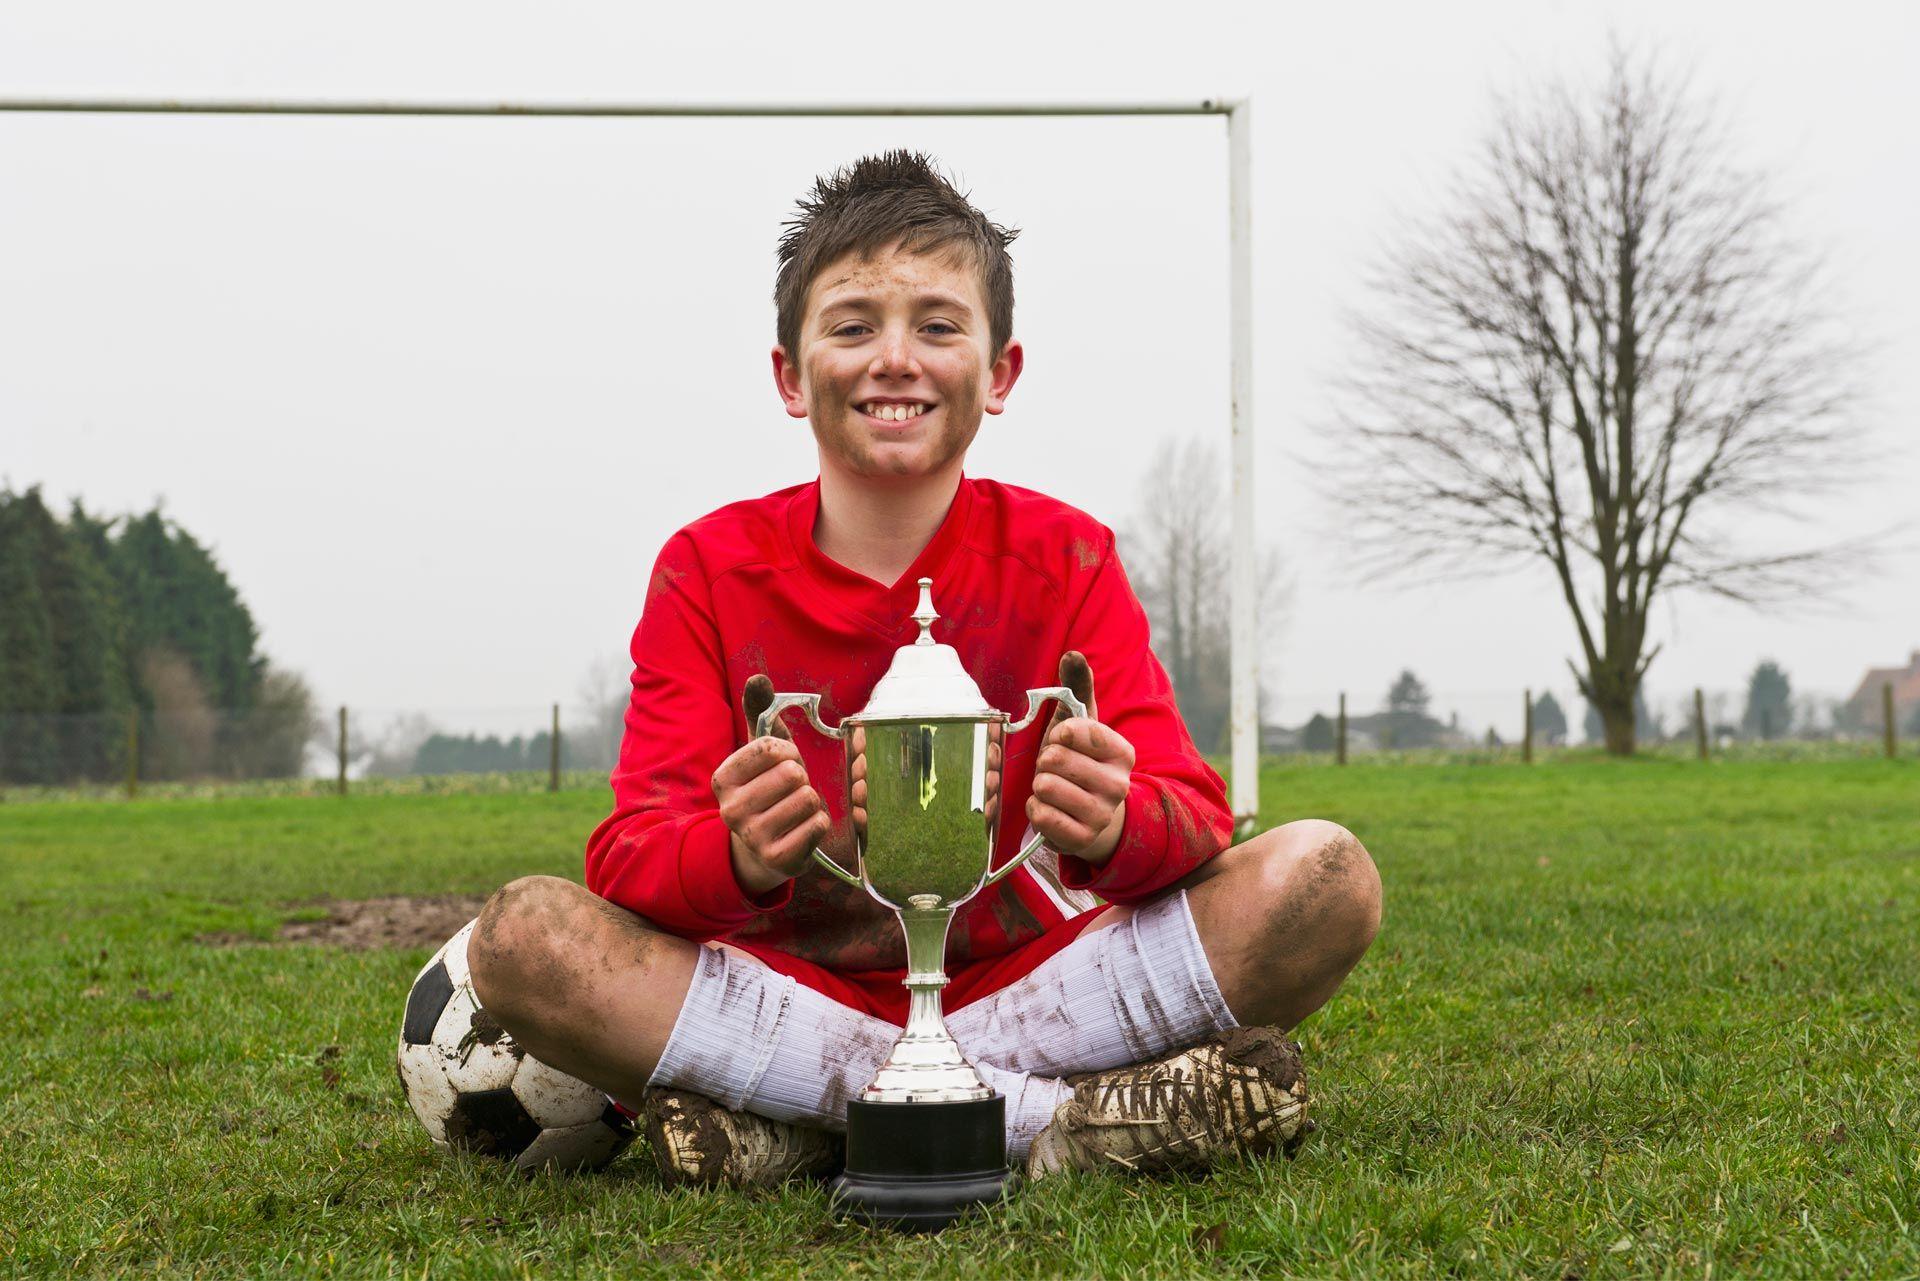 a boy with a trophy